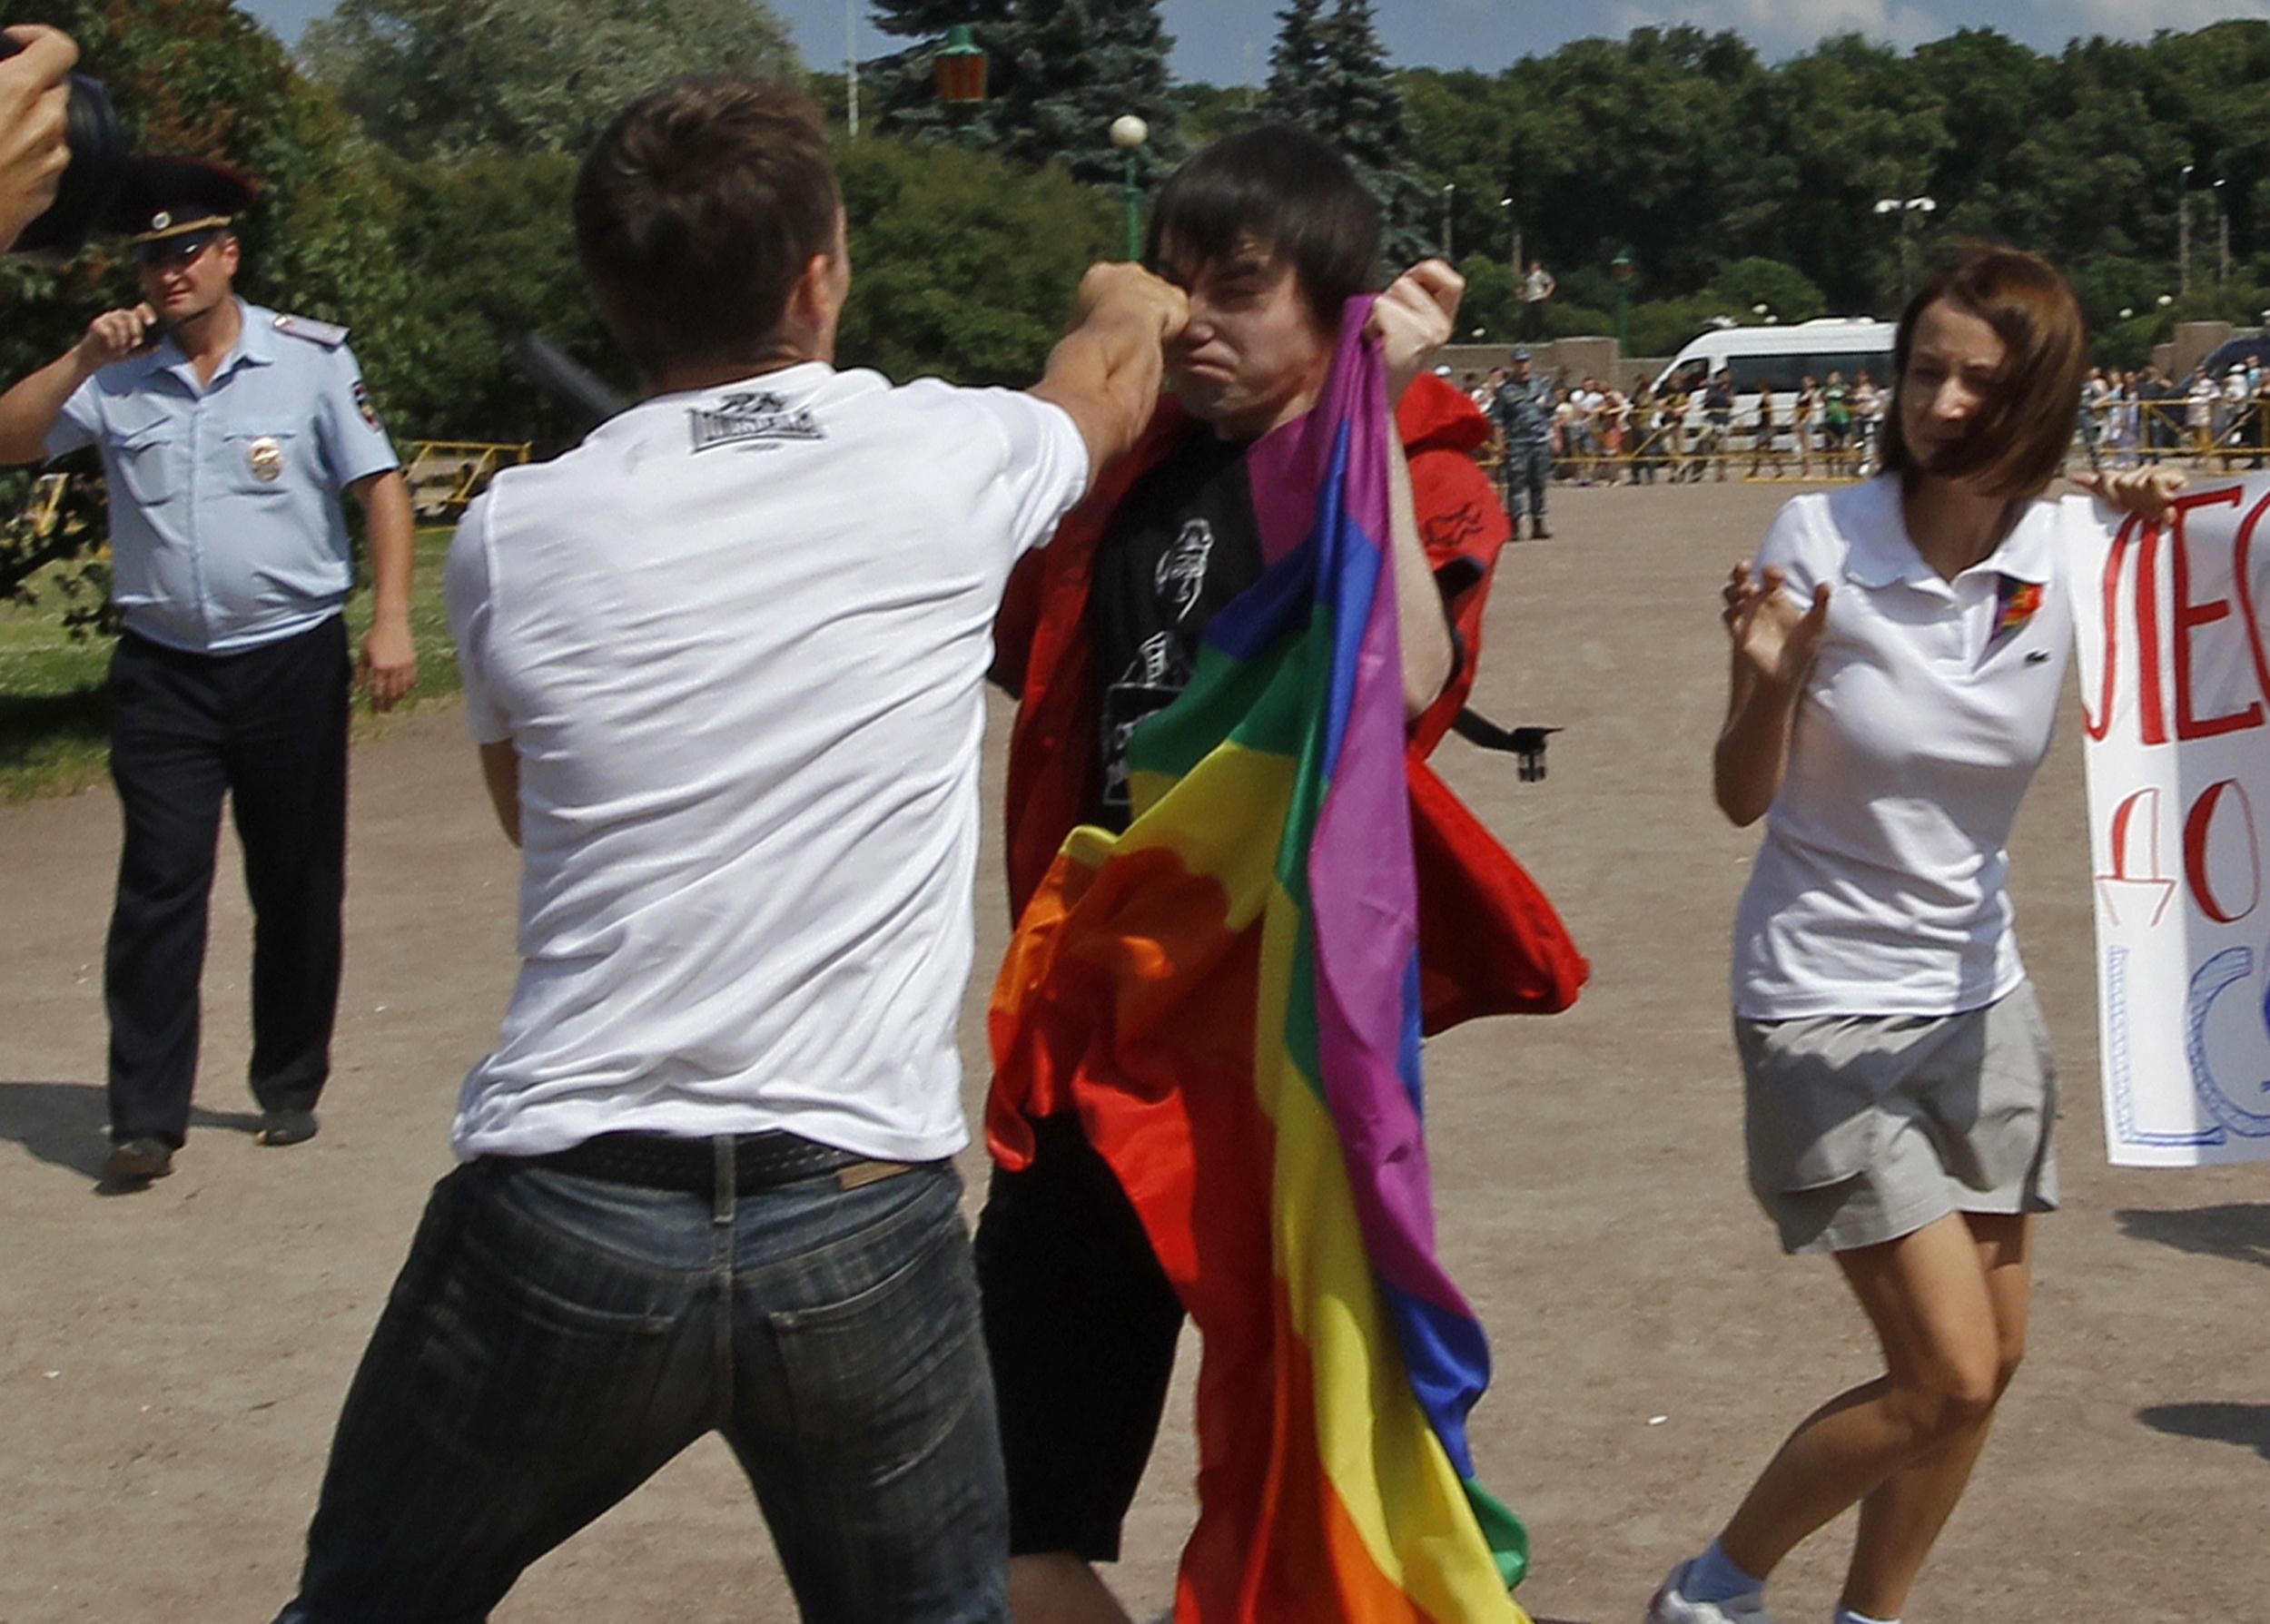 Lesbian brutality